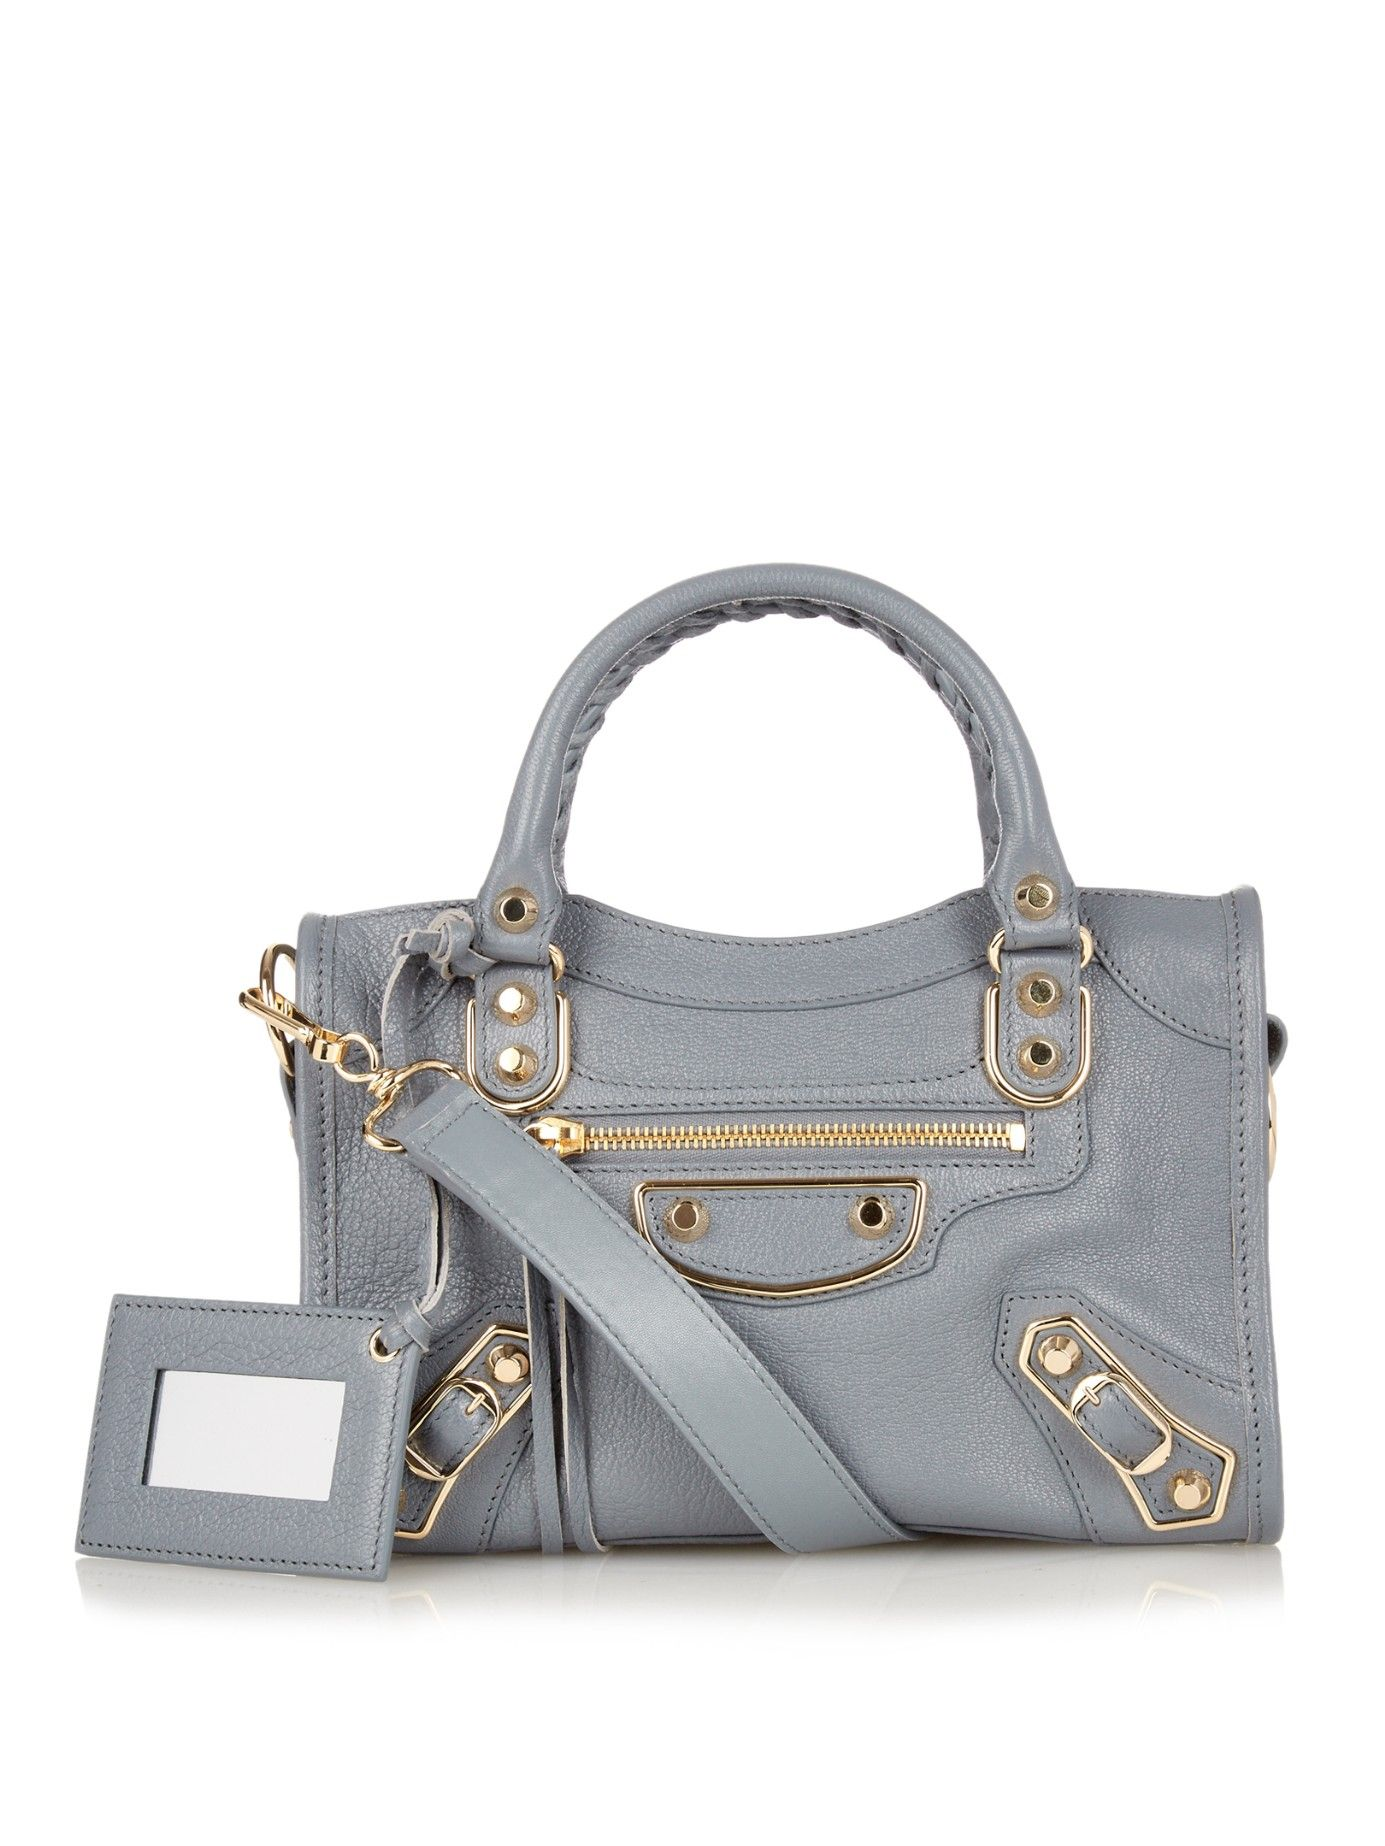 Balenciaga Mini City Bag Sale